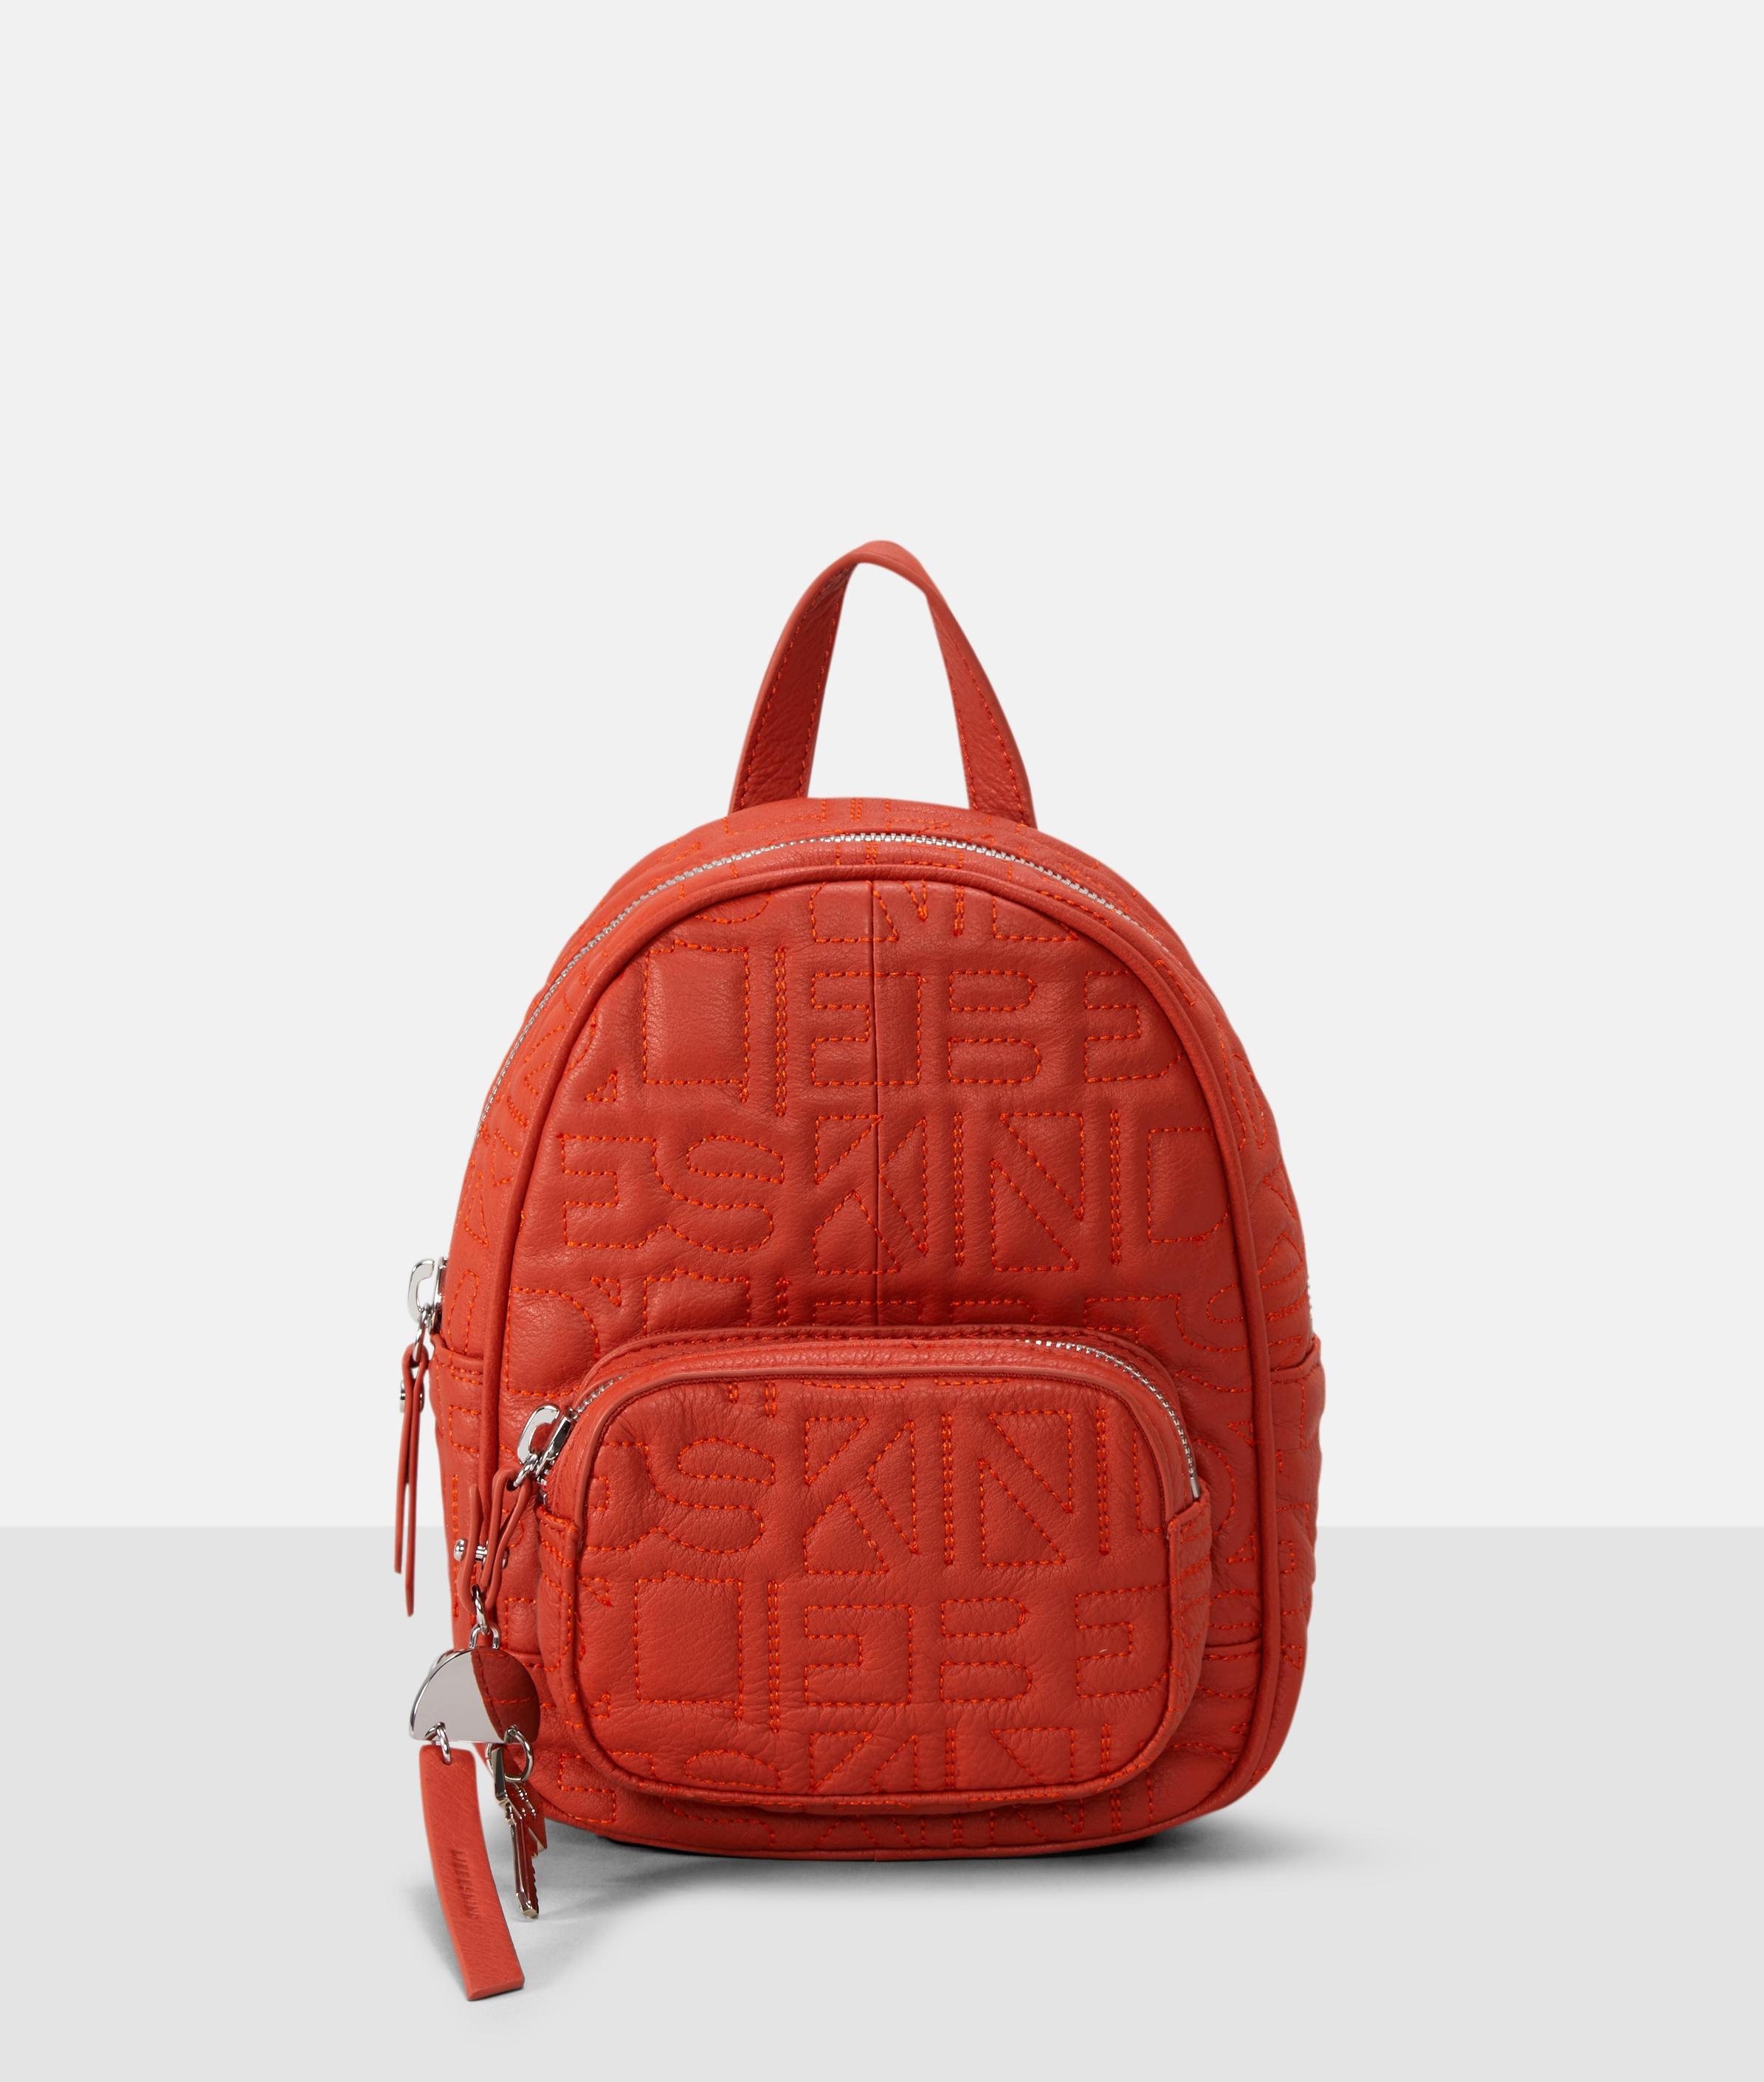 Berlin Tasche Urban Monogram Backpack S, Orange